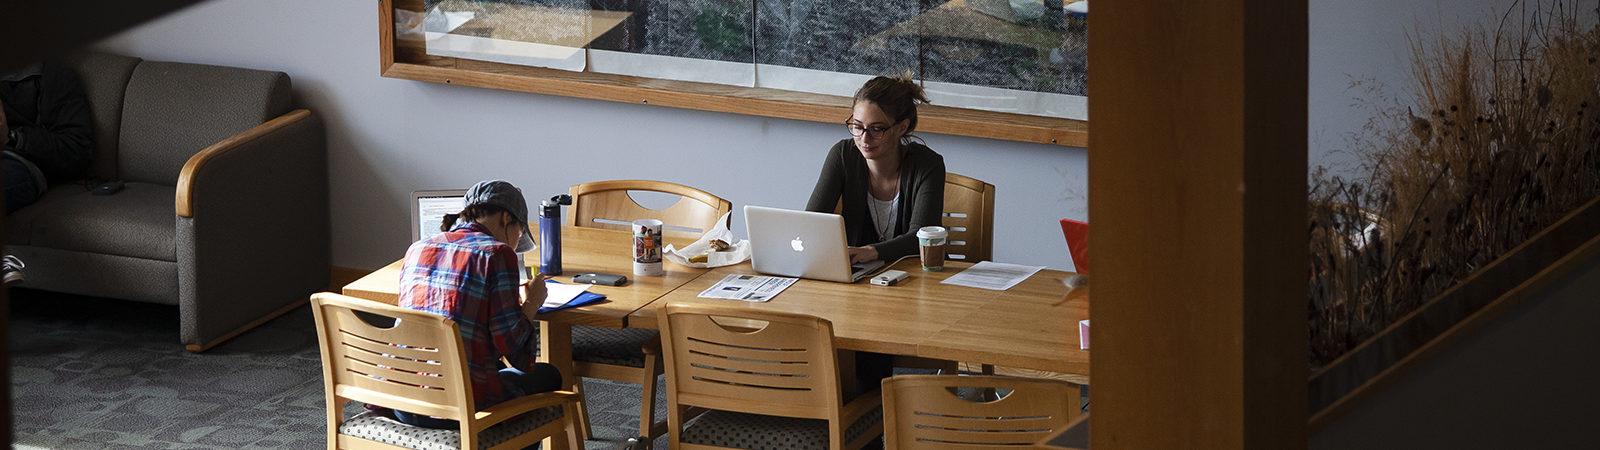 Studying at Ponzio Center Northland College